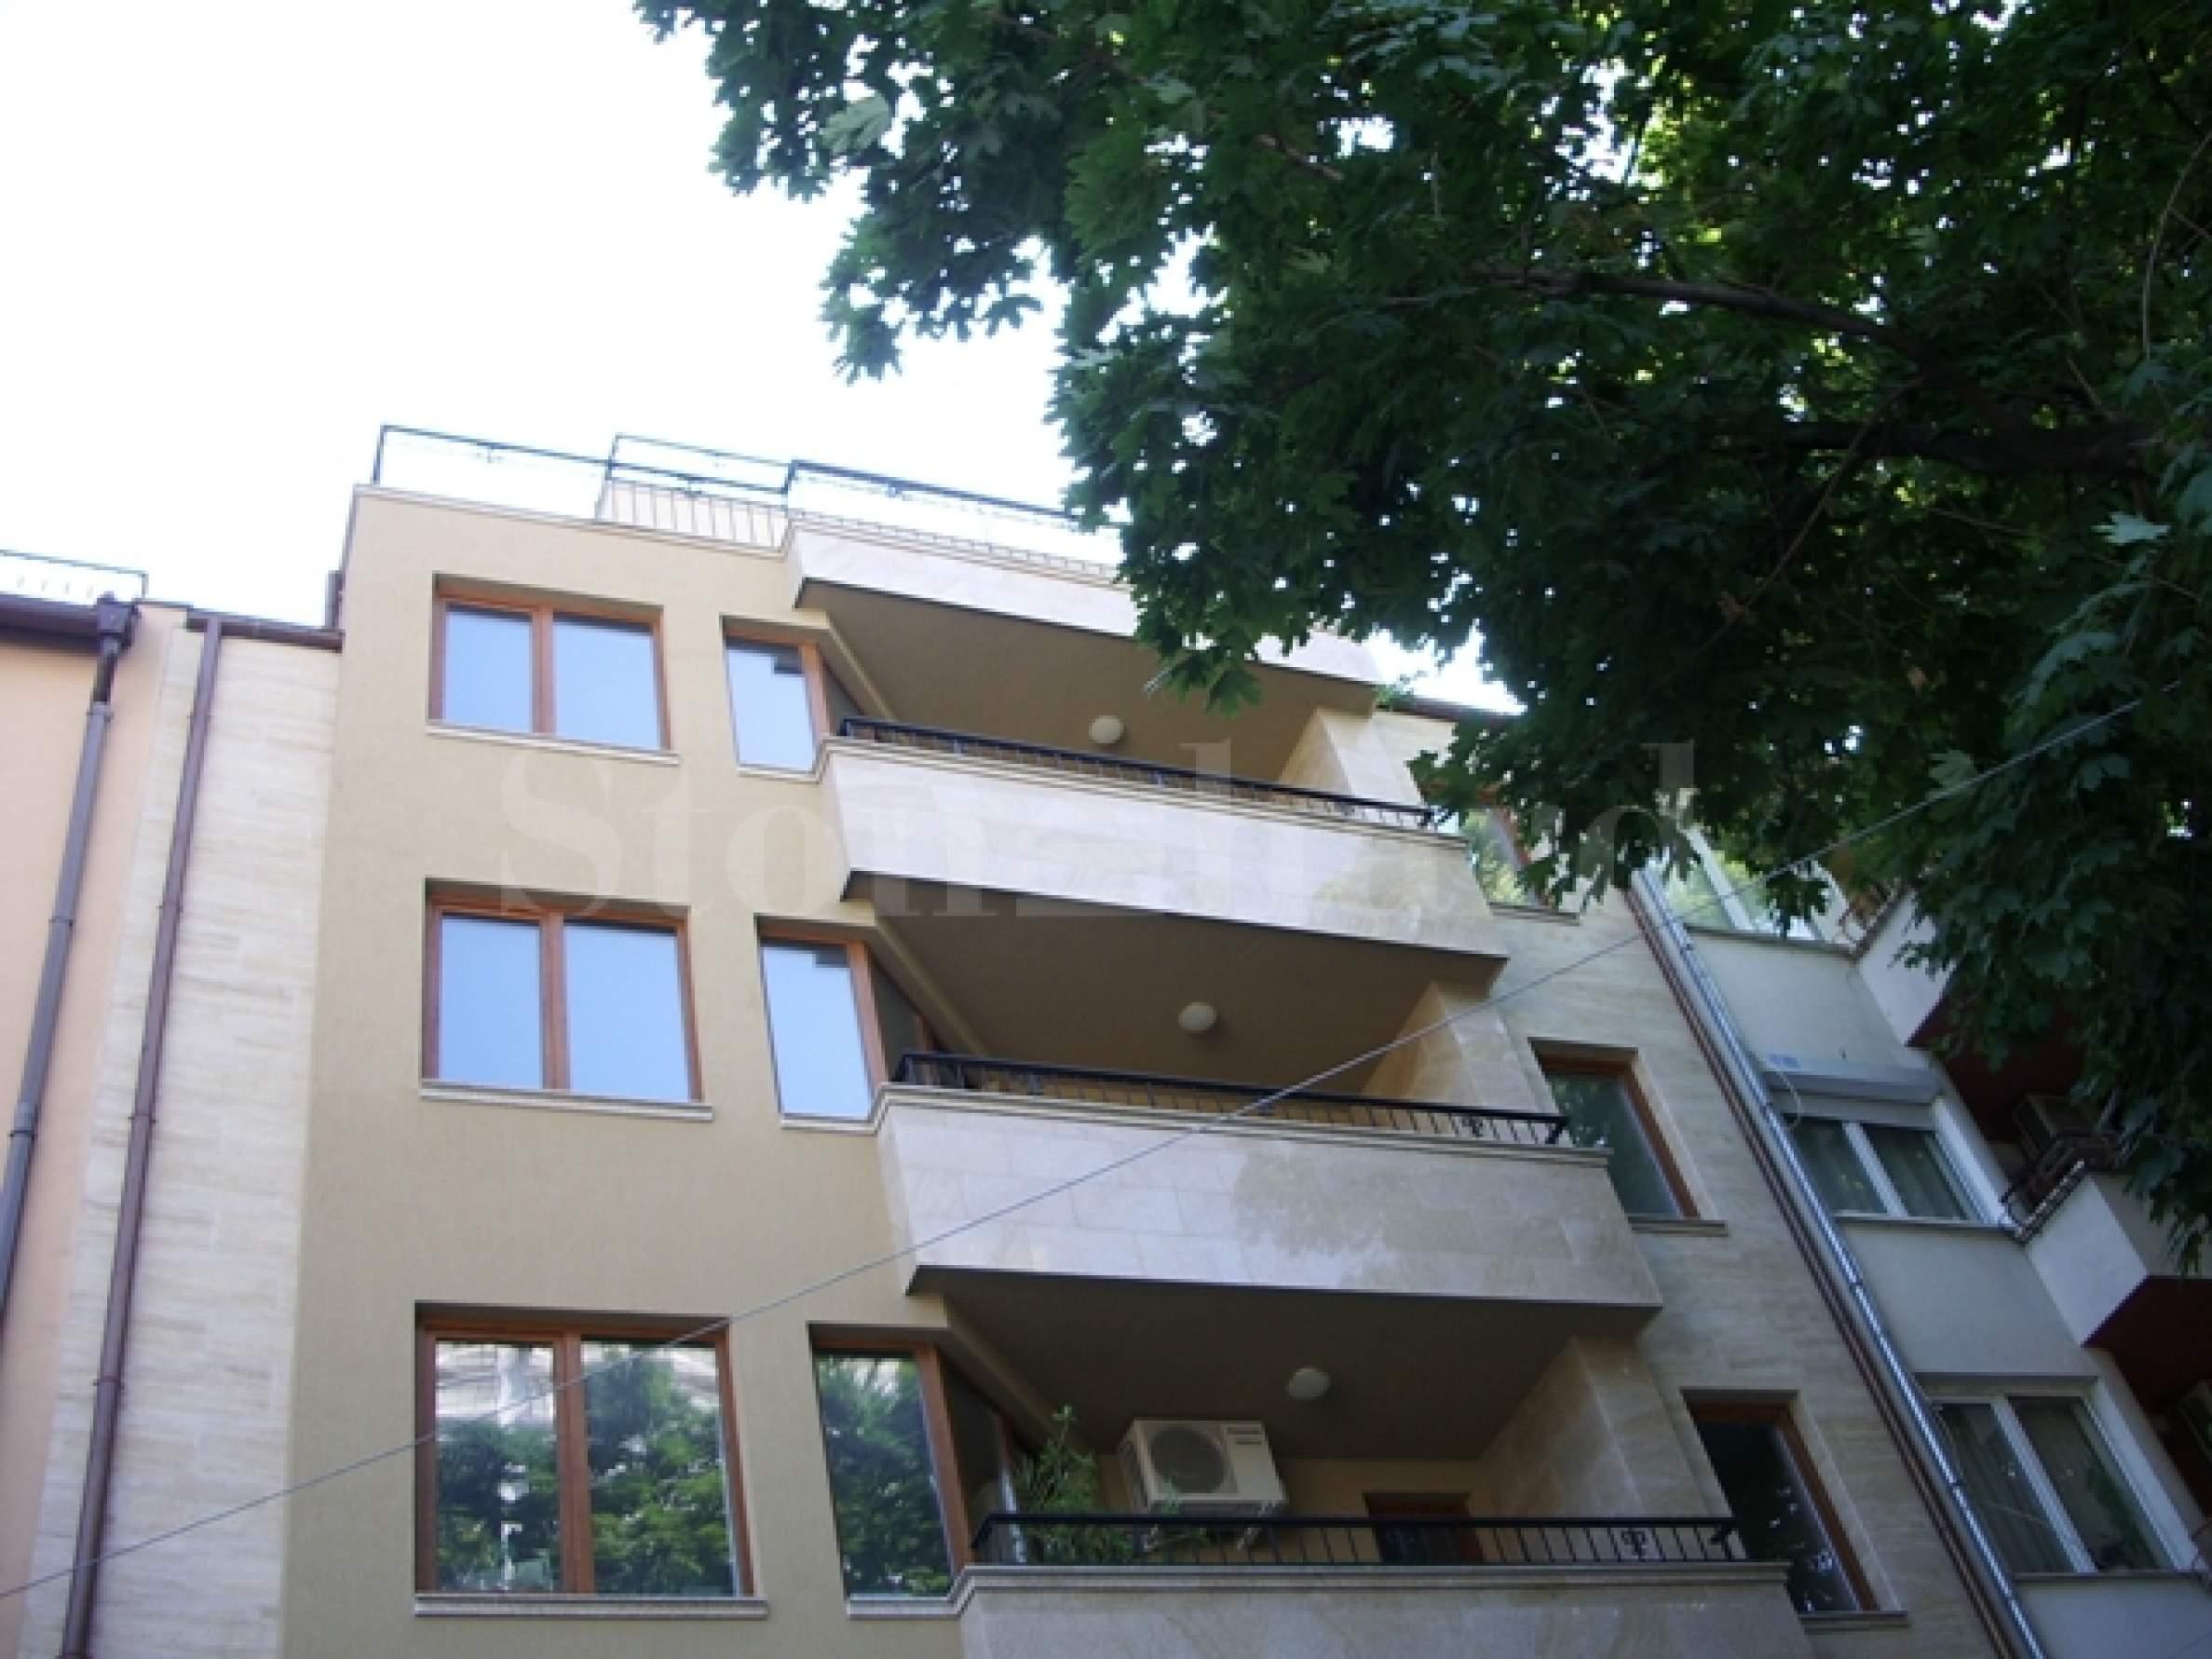 Апартаменти и офис в стилна сграда1 - Stonehard